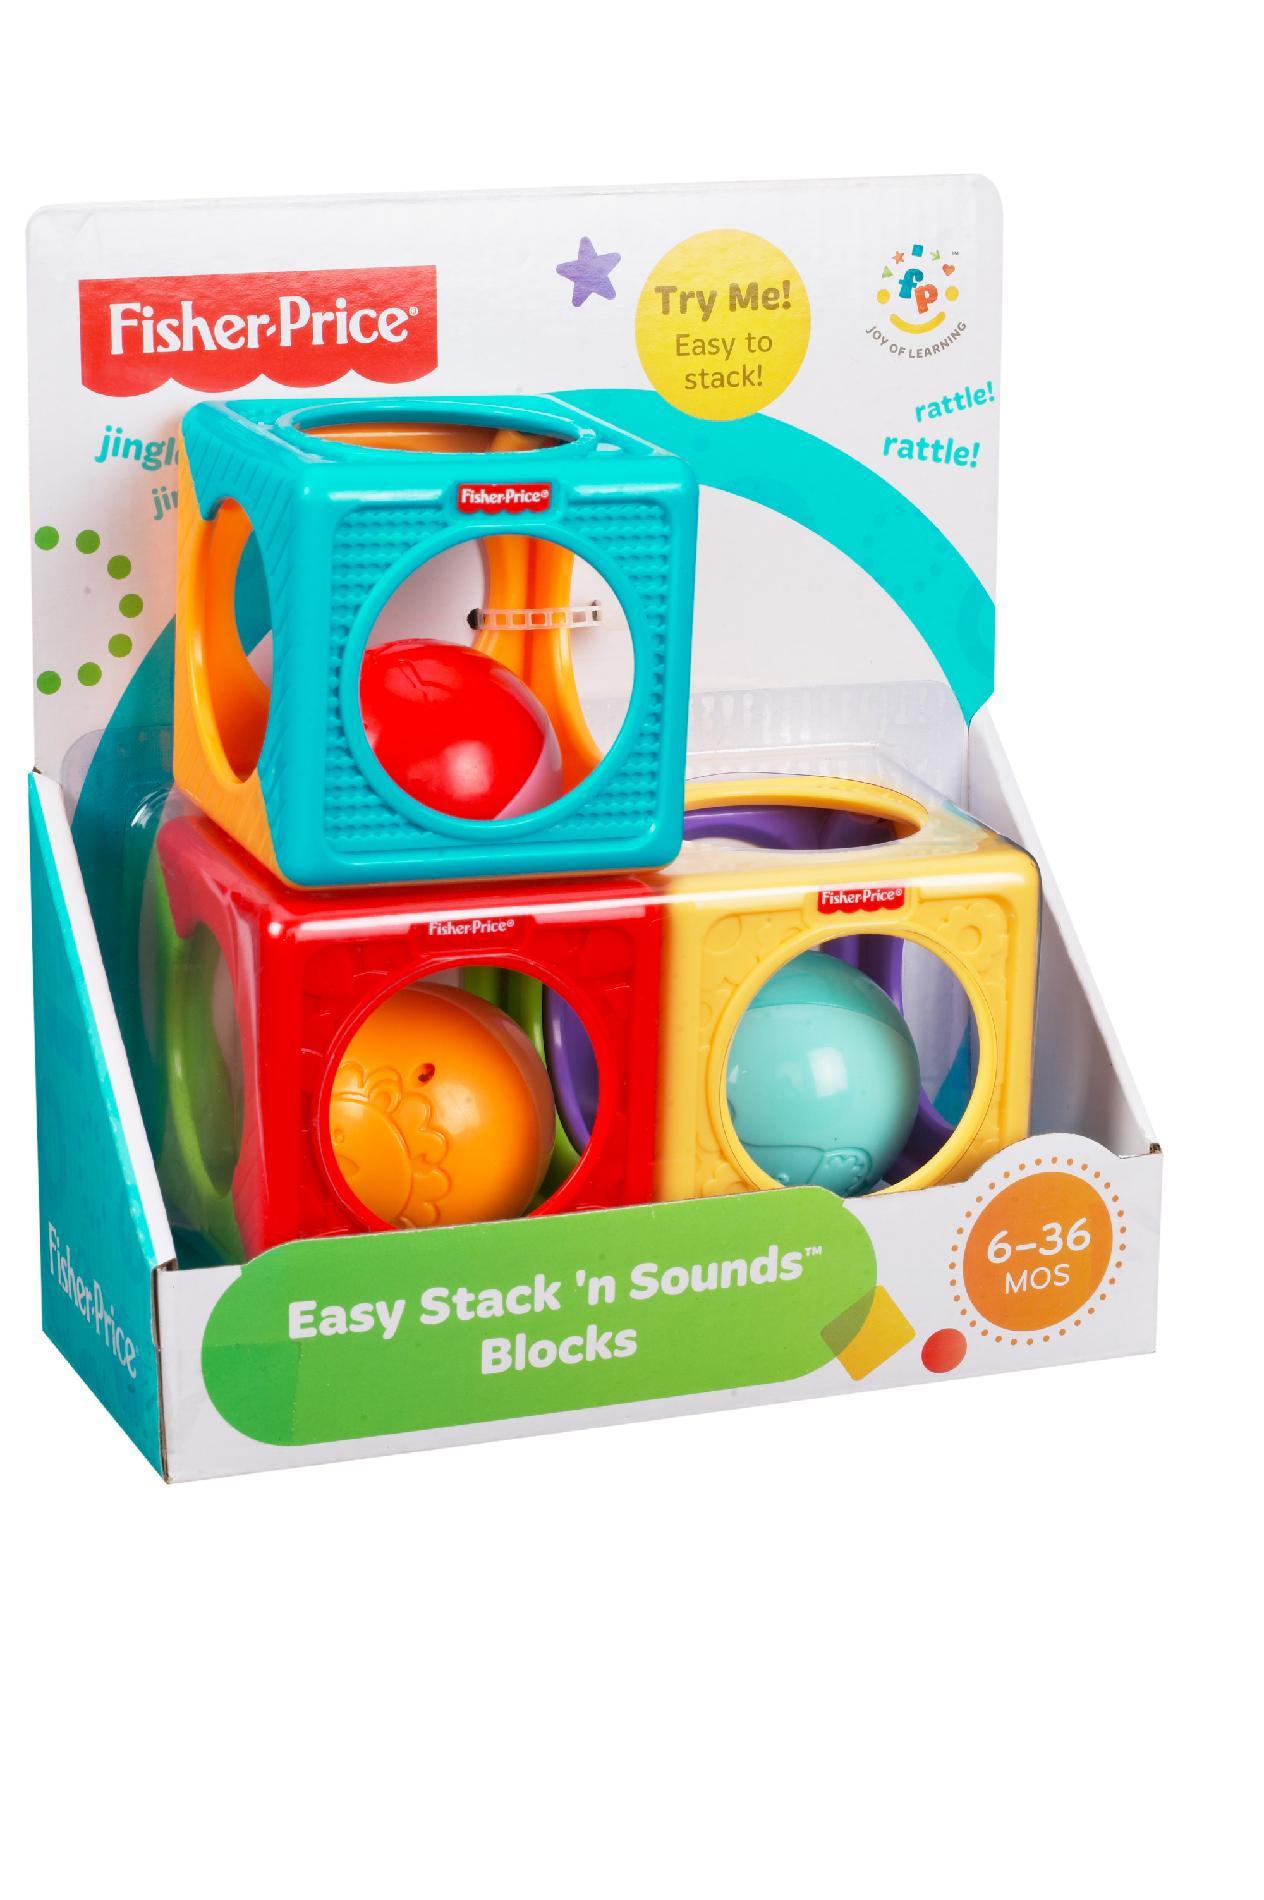 FisherPrice Easy Stack n Sounds Blocks  Toys  Games